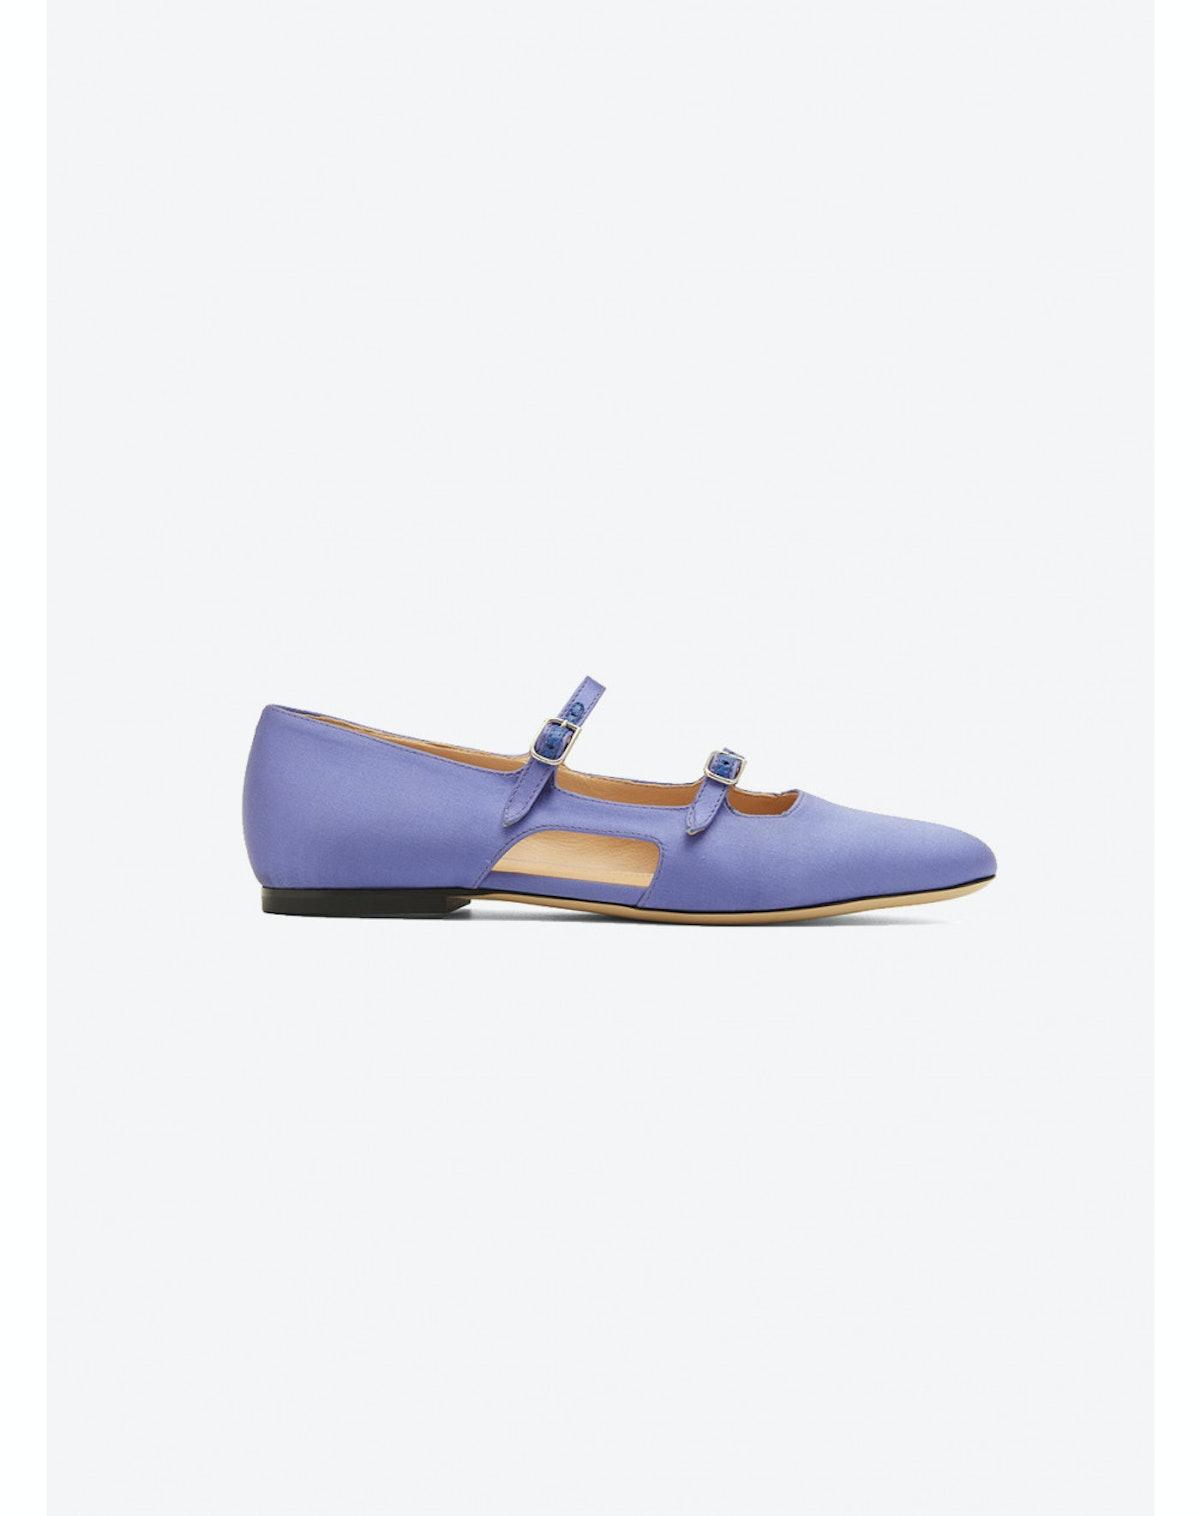 Mary Jane Satin Shoes